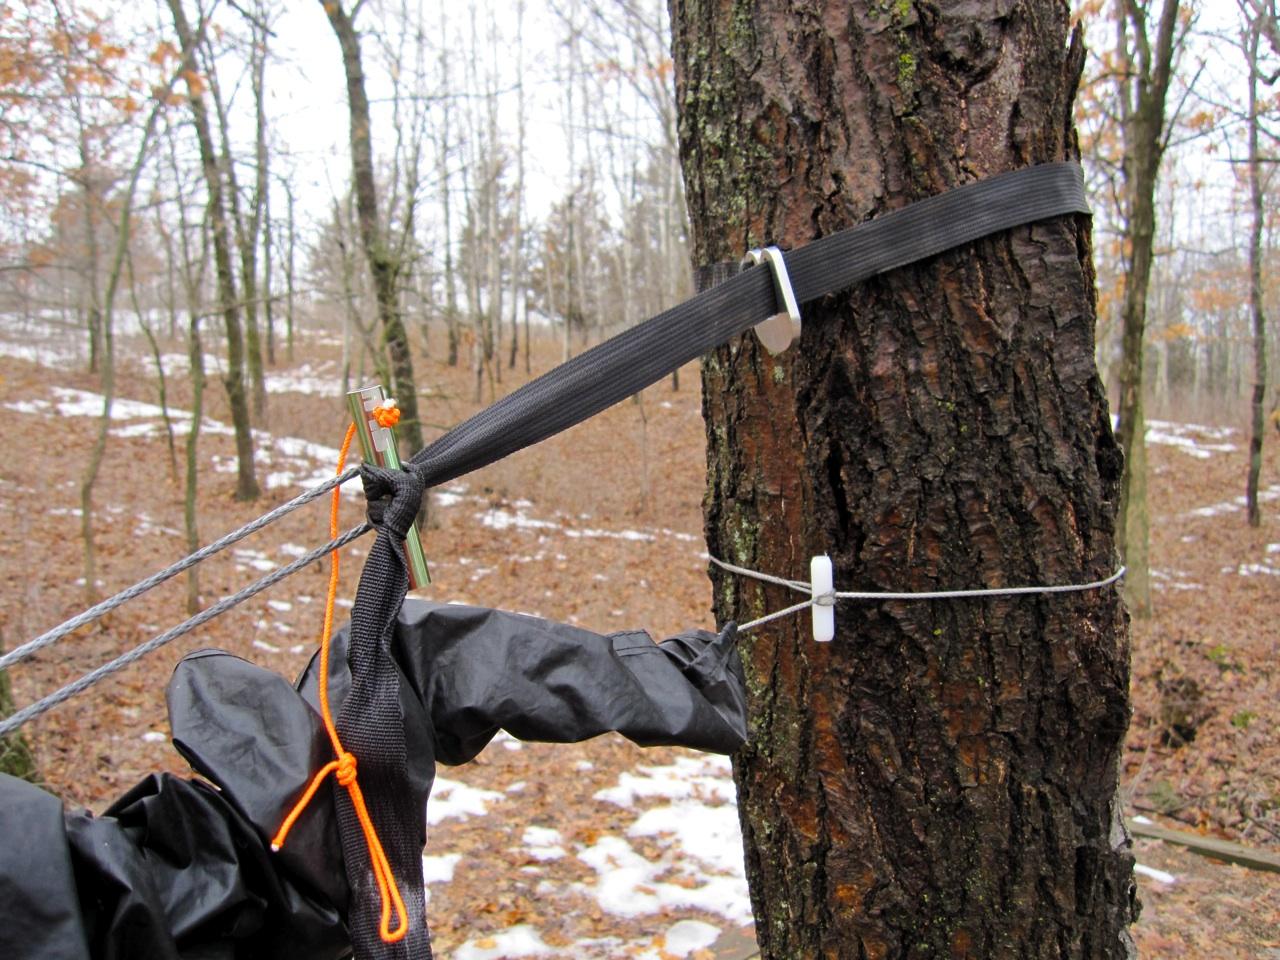 Tree Hugger, Marlin-spike, Toggle (slurpee Straw), Whoopie Sling